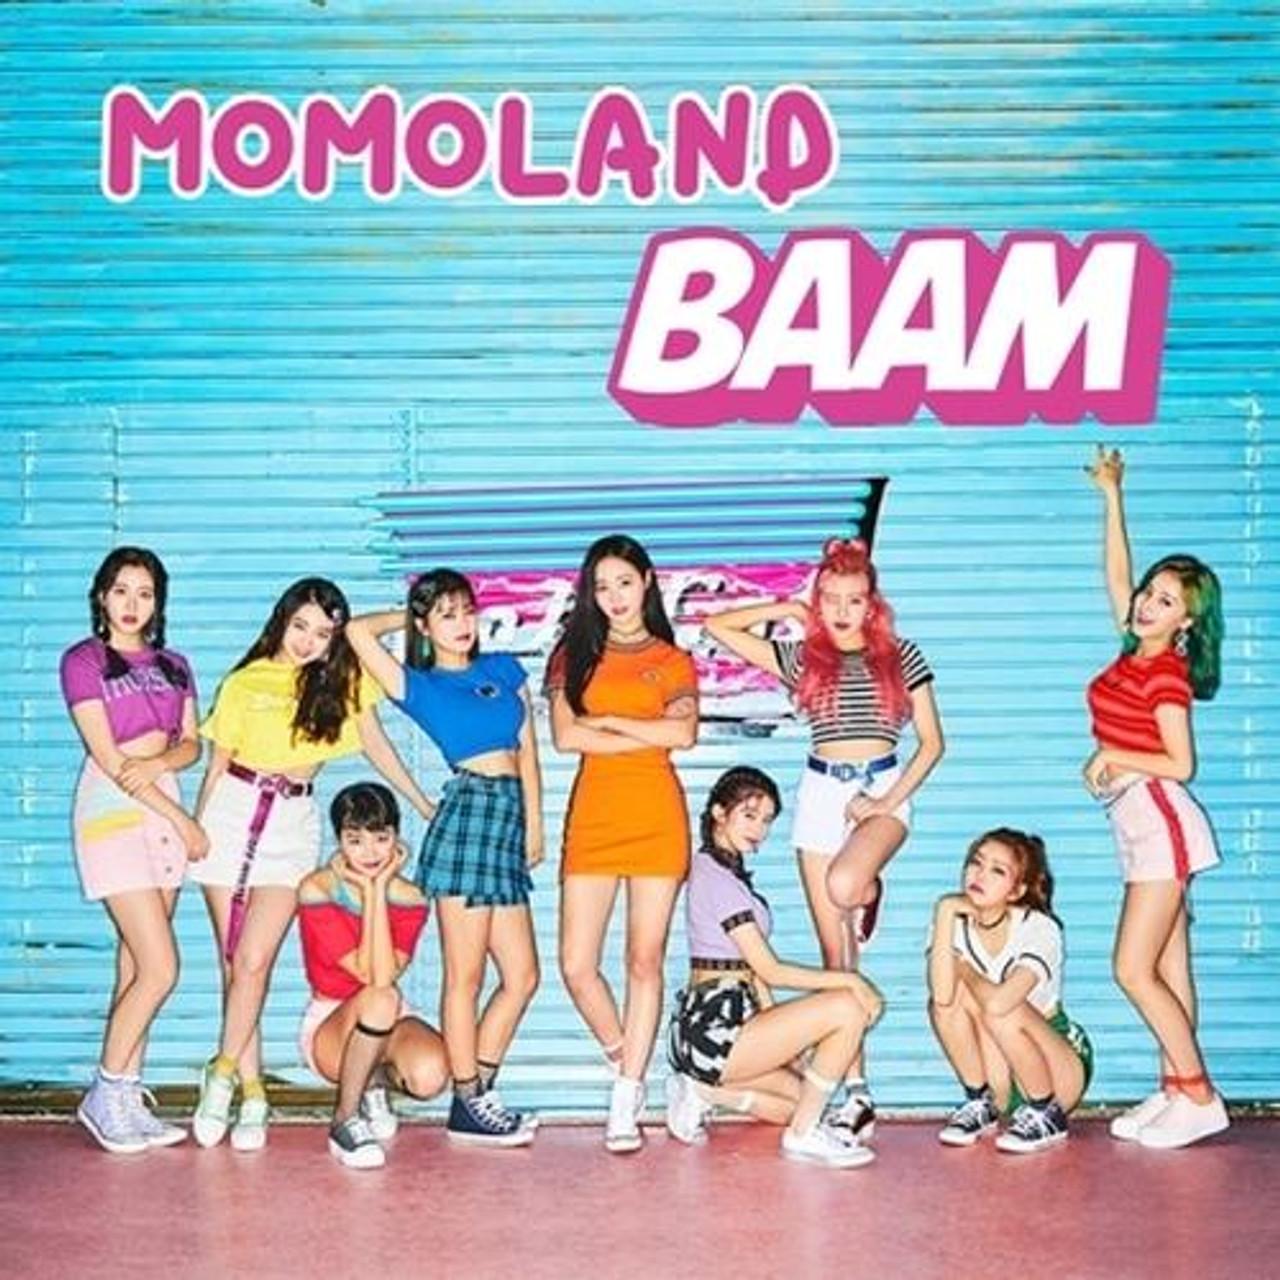 MOMOLAND - 4th Mini [FUN TO THE WORLD] + Poster